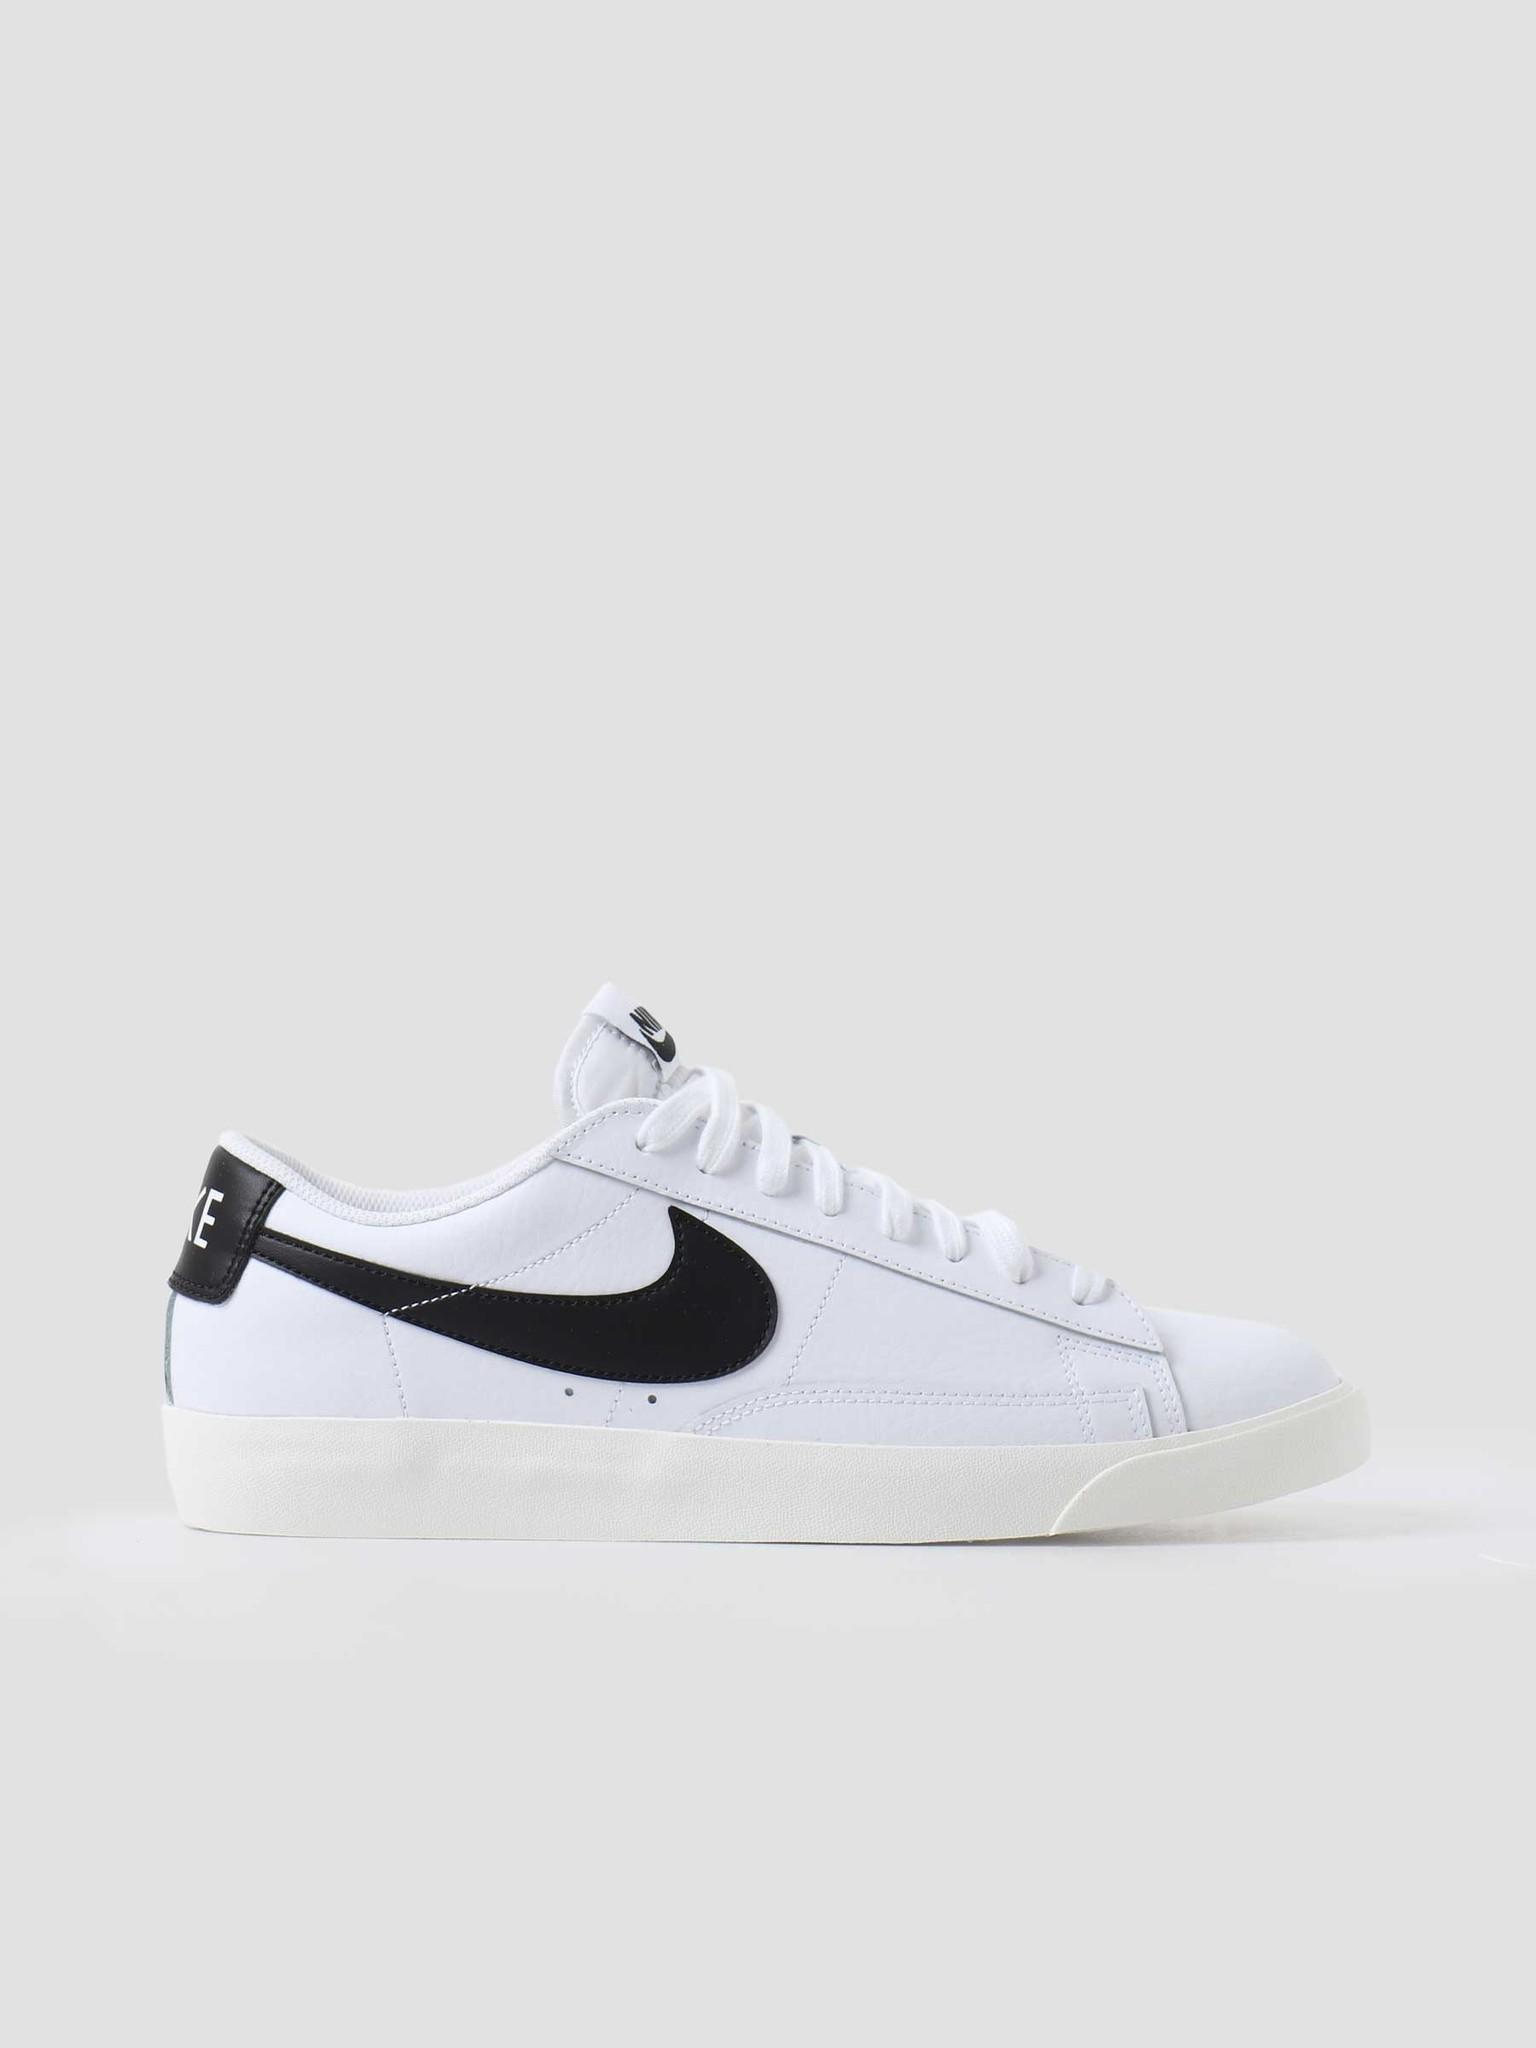 Nike Nike Blazer Low Leather White Black Sail CI6377-101